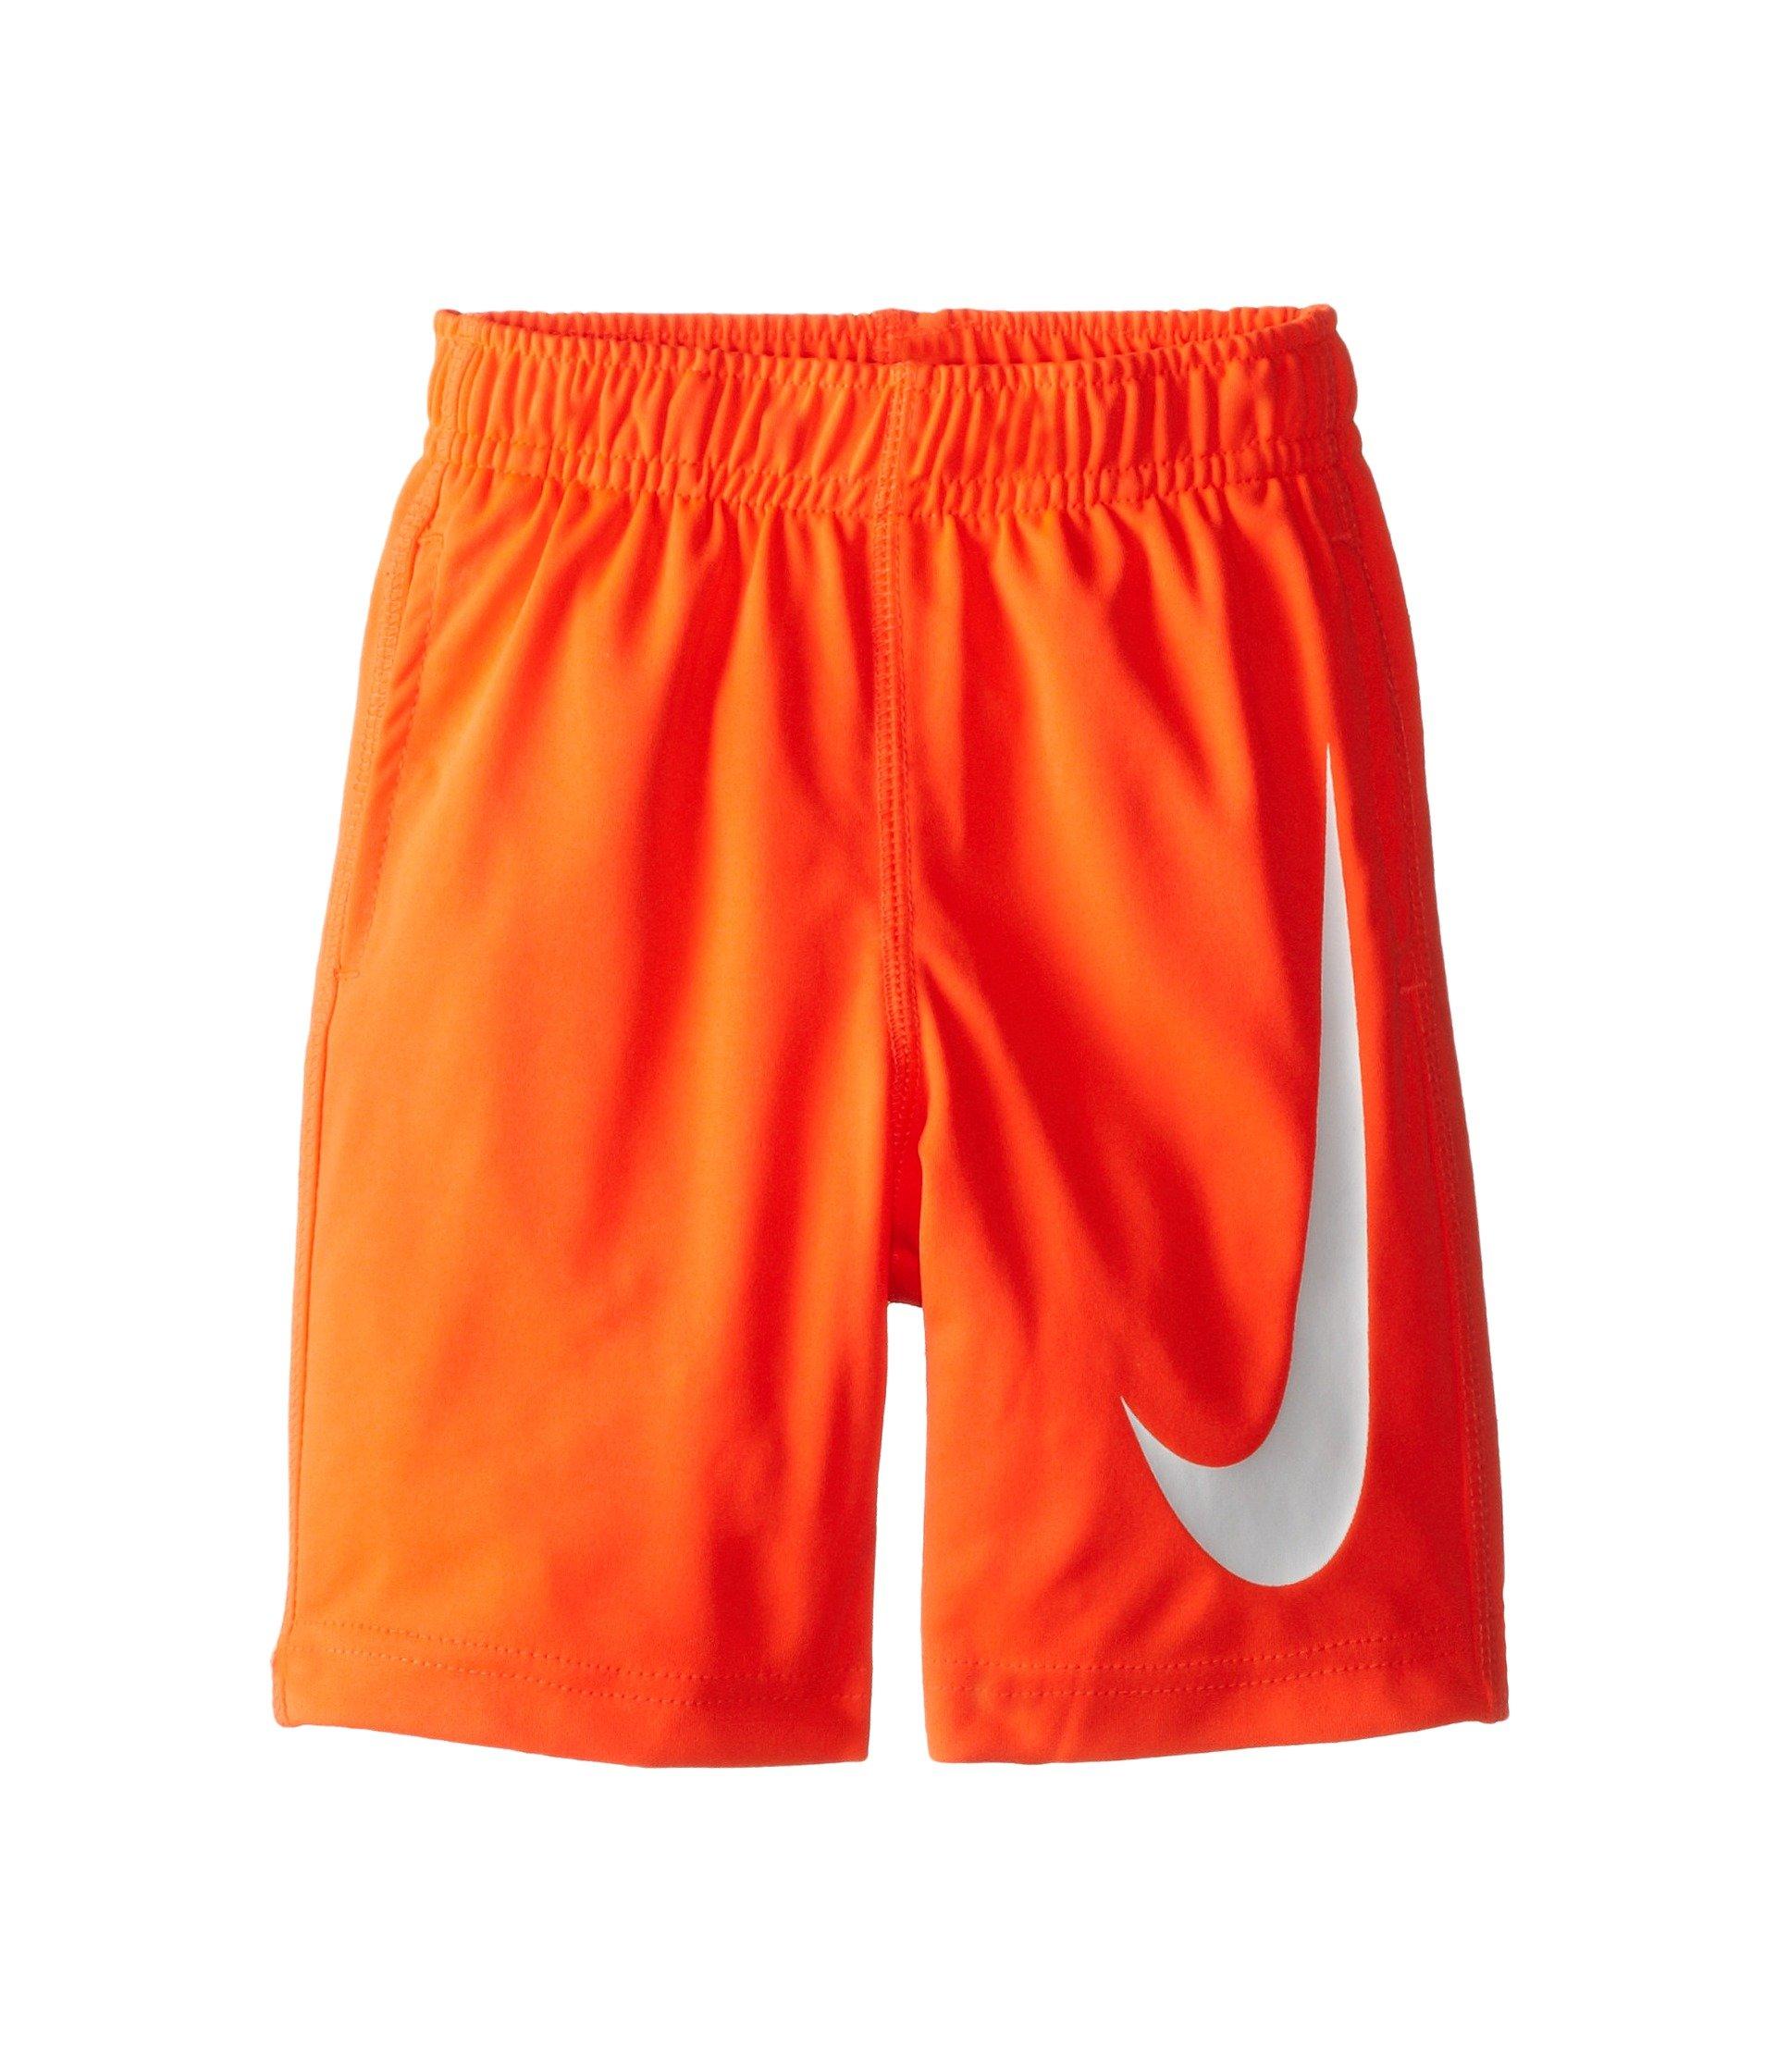 Nike Kids Boys Performance Swoosh Shorts (Toddler), Bright Crimson, 2T by Nike